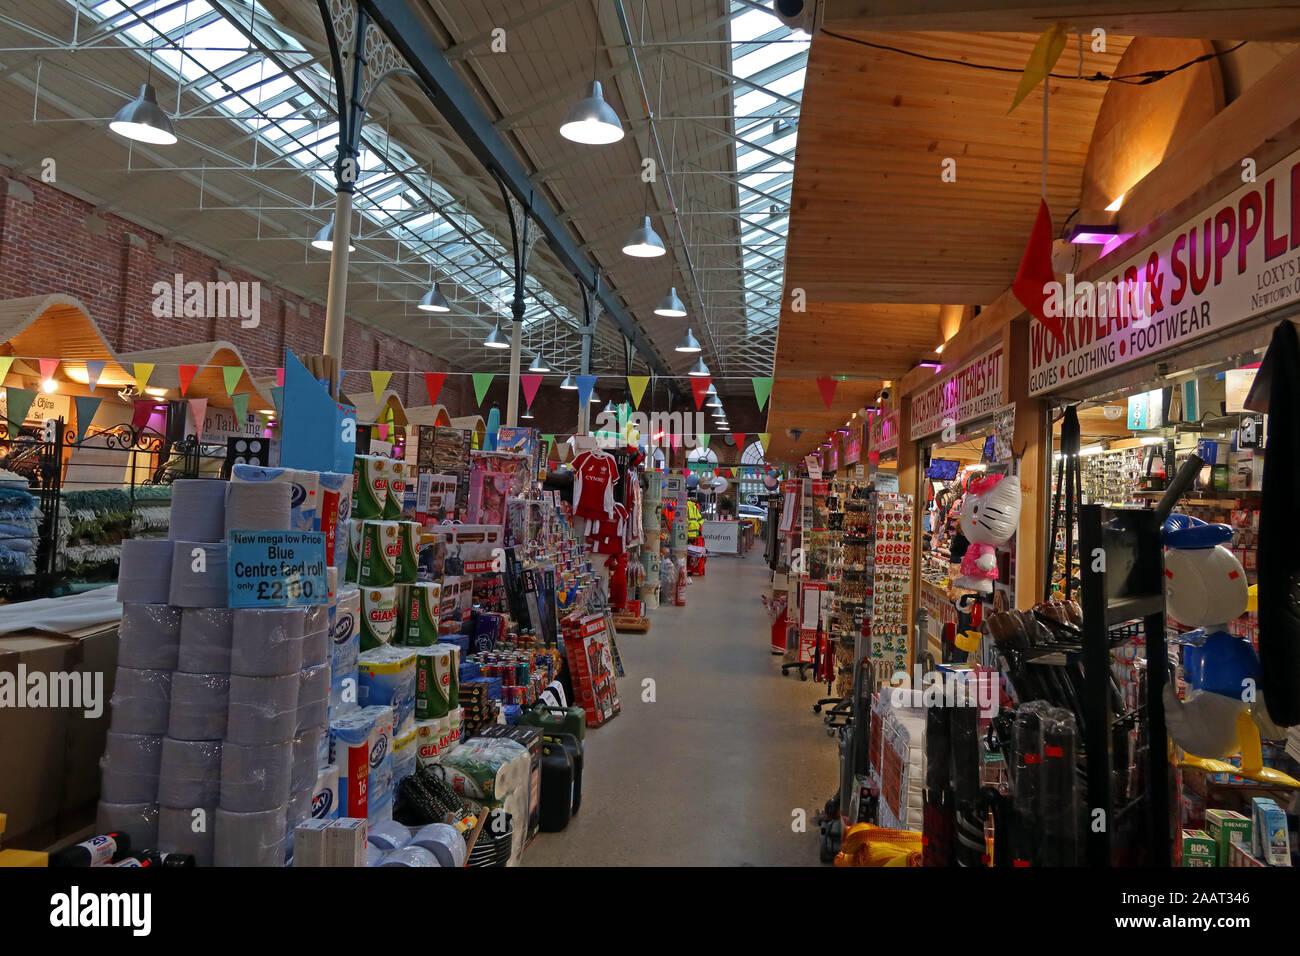 Dieses Stockfoto: In Newtown Markt, Market Street, Newtown, Powys, Wales, SY16 2PQ - 2AAT34